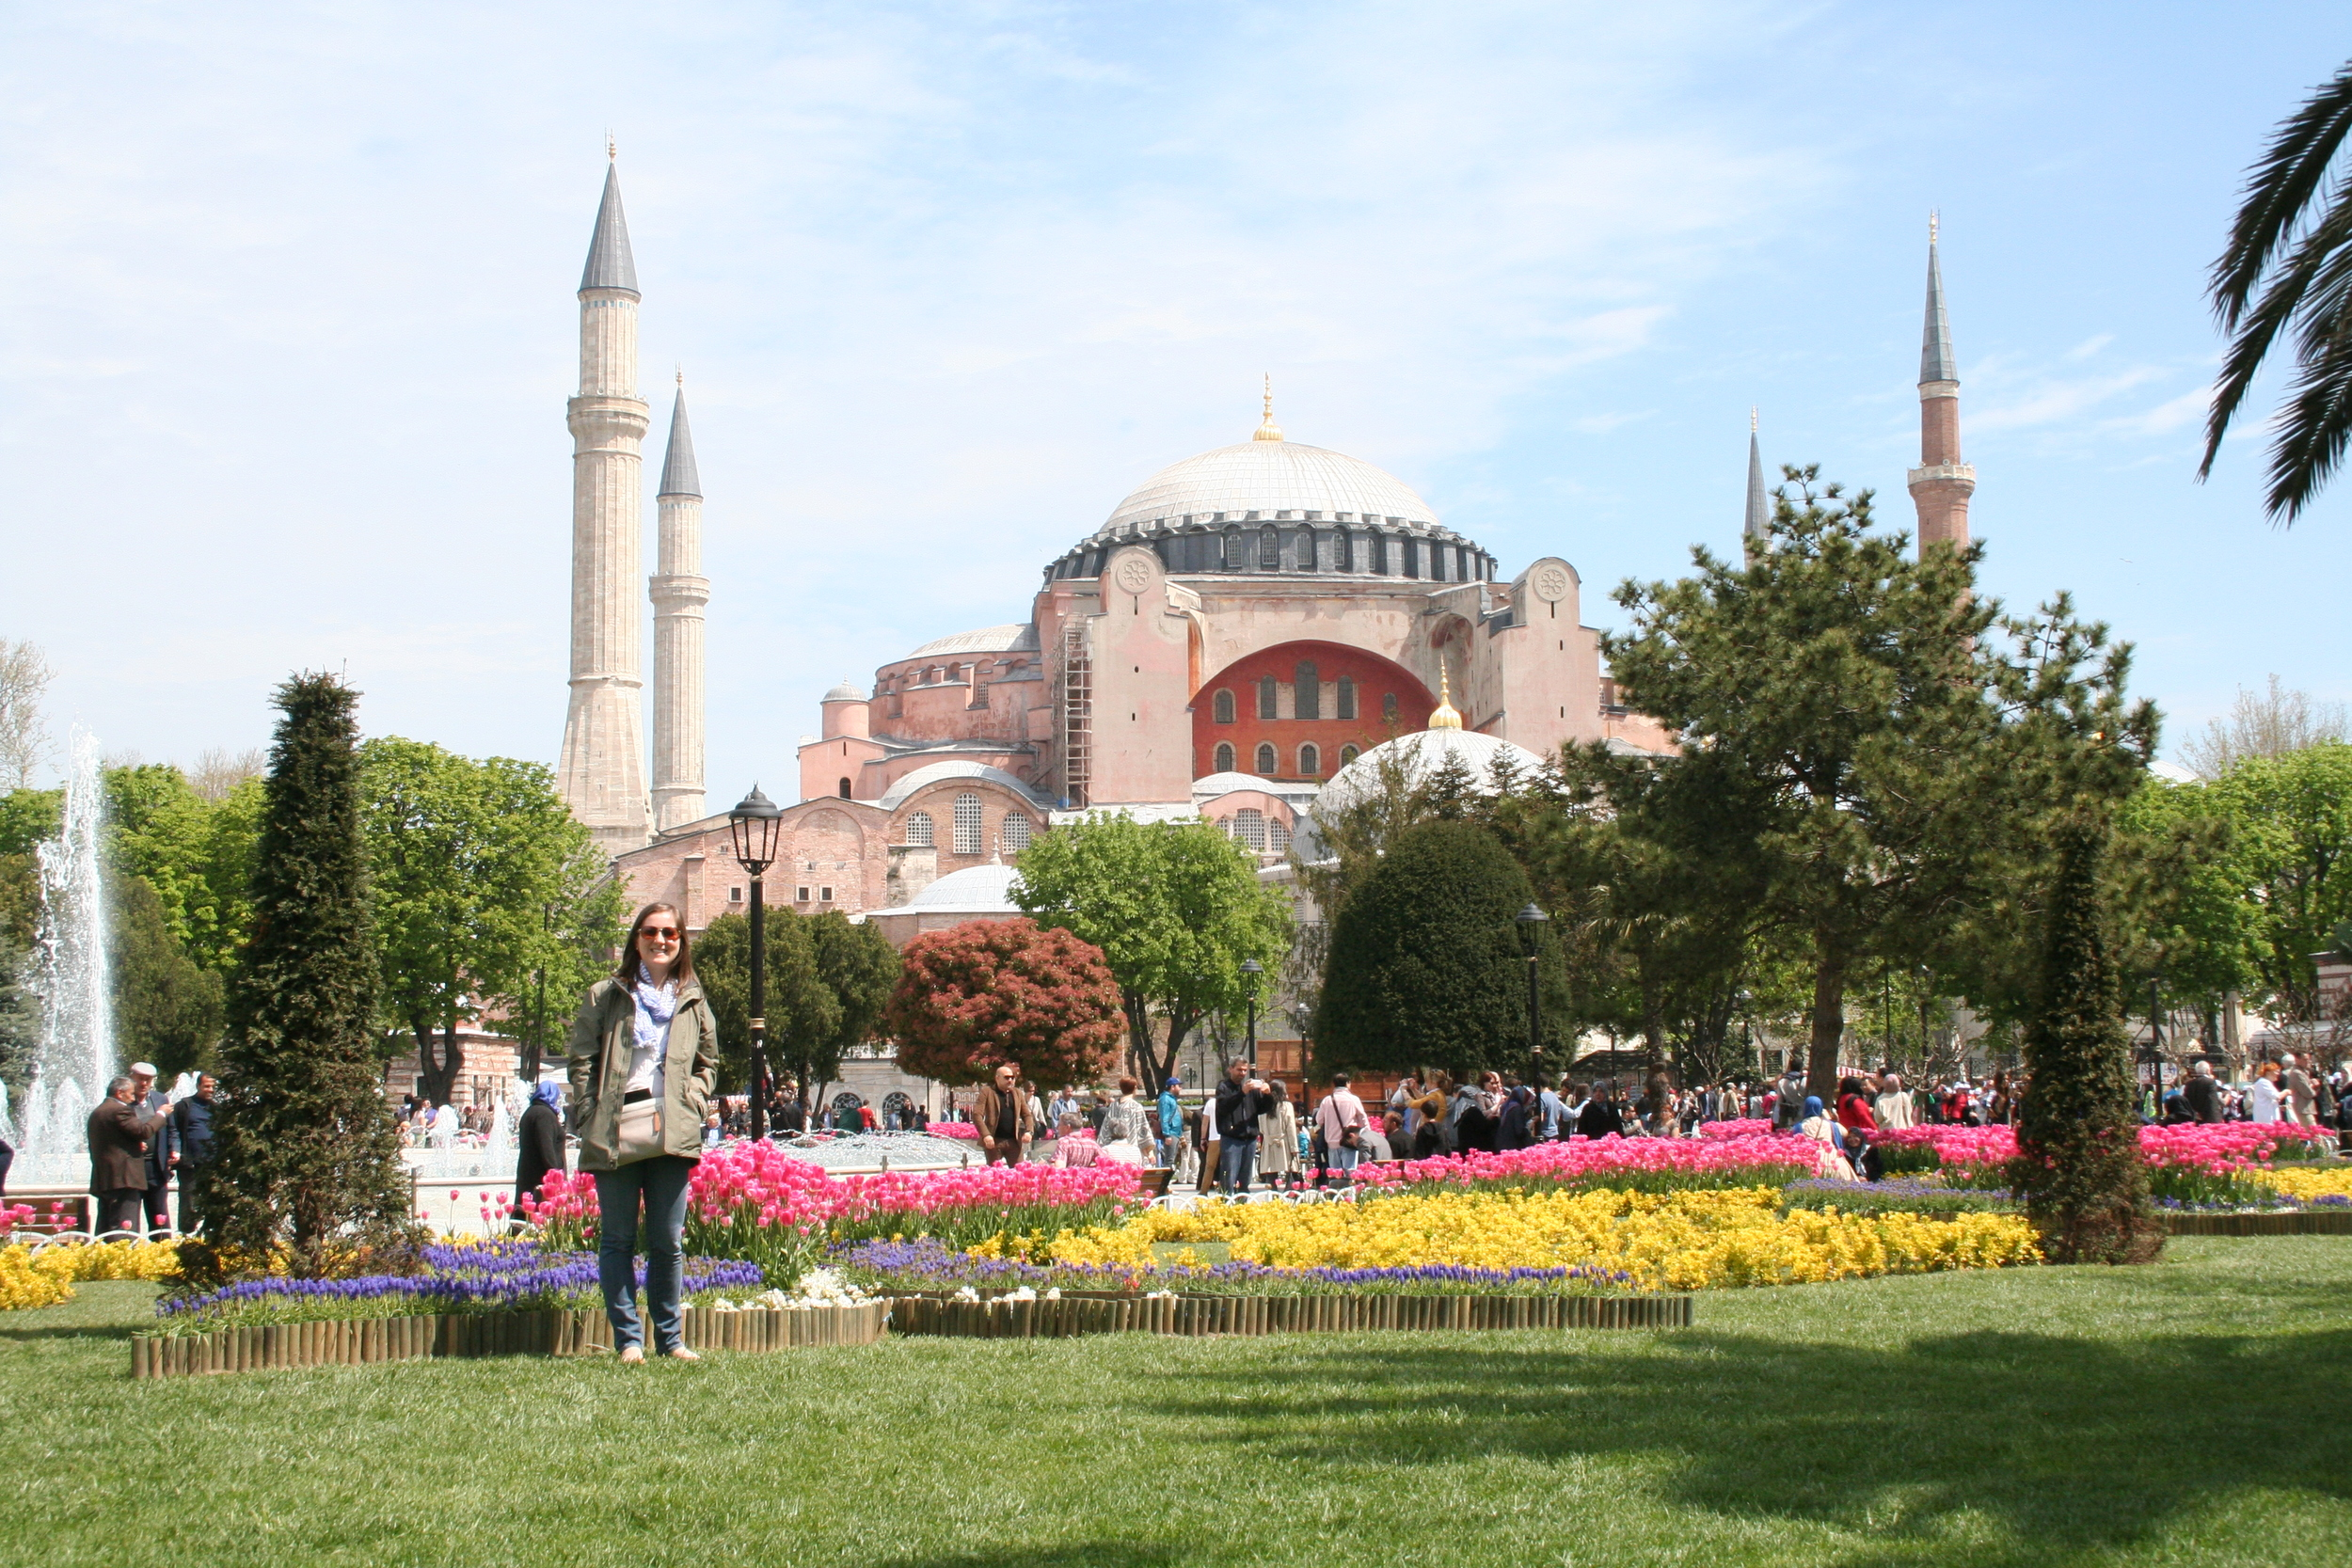 Me in Sultanahmet Park, looking towards the Hagia Sophia